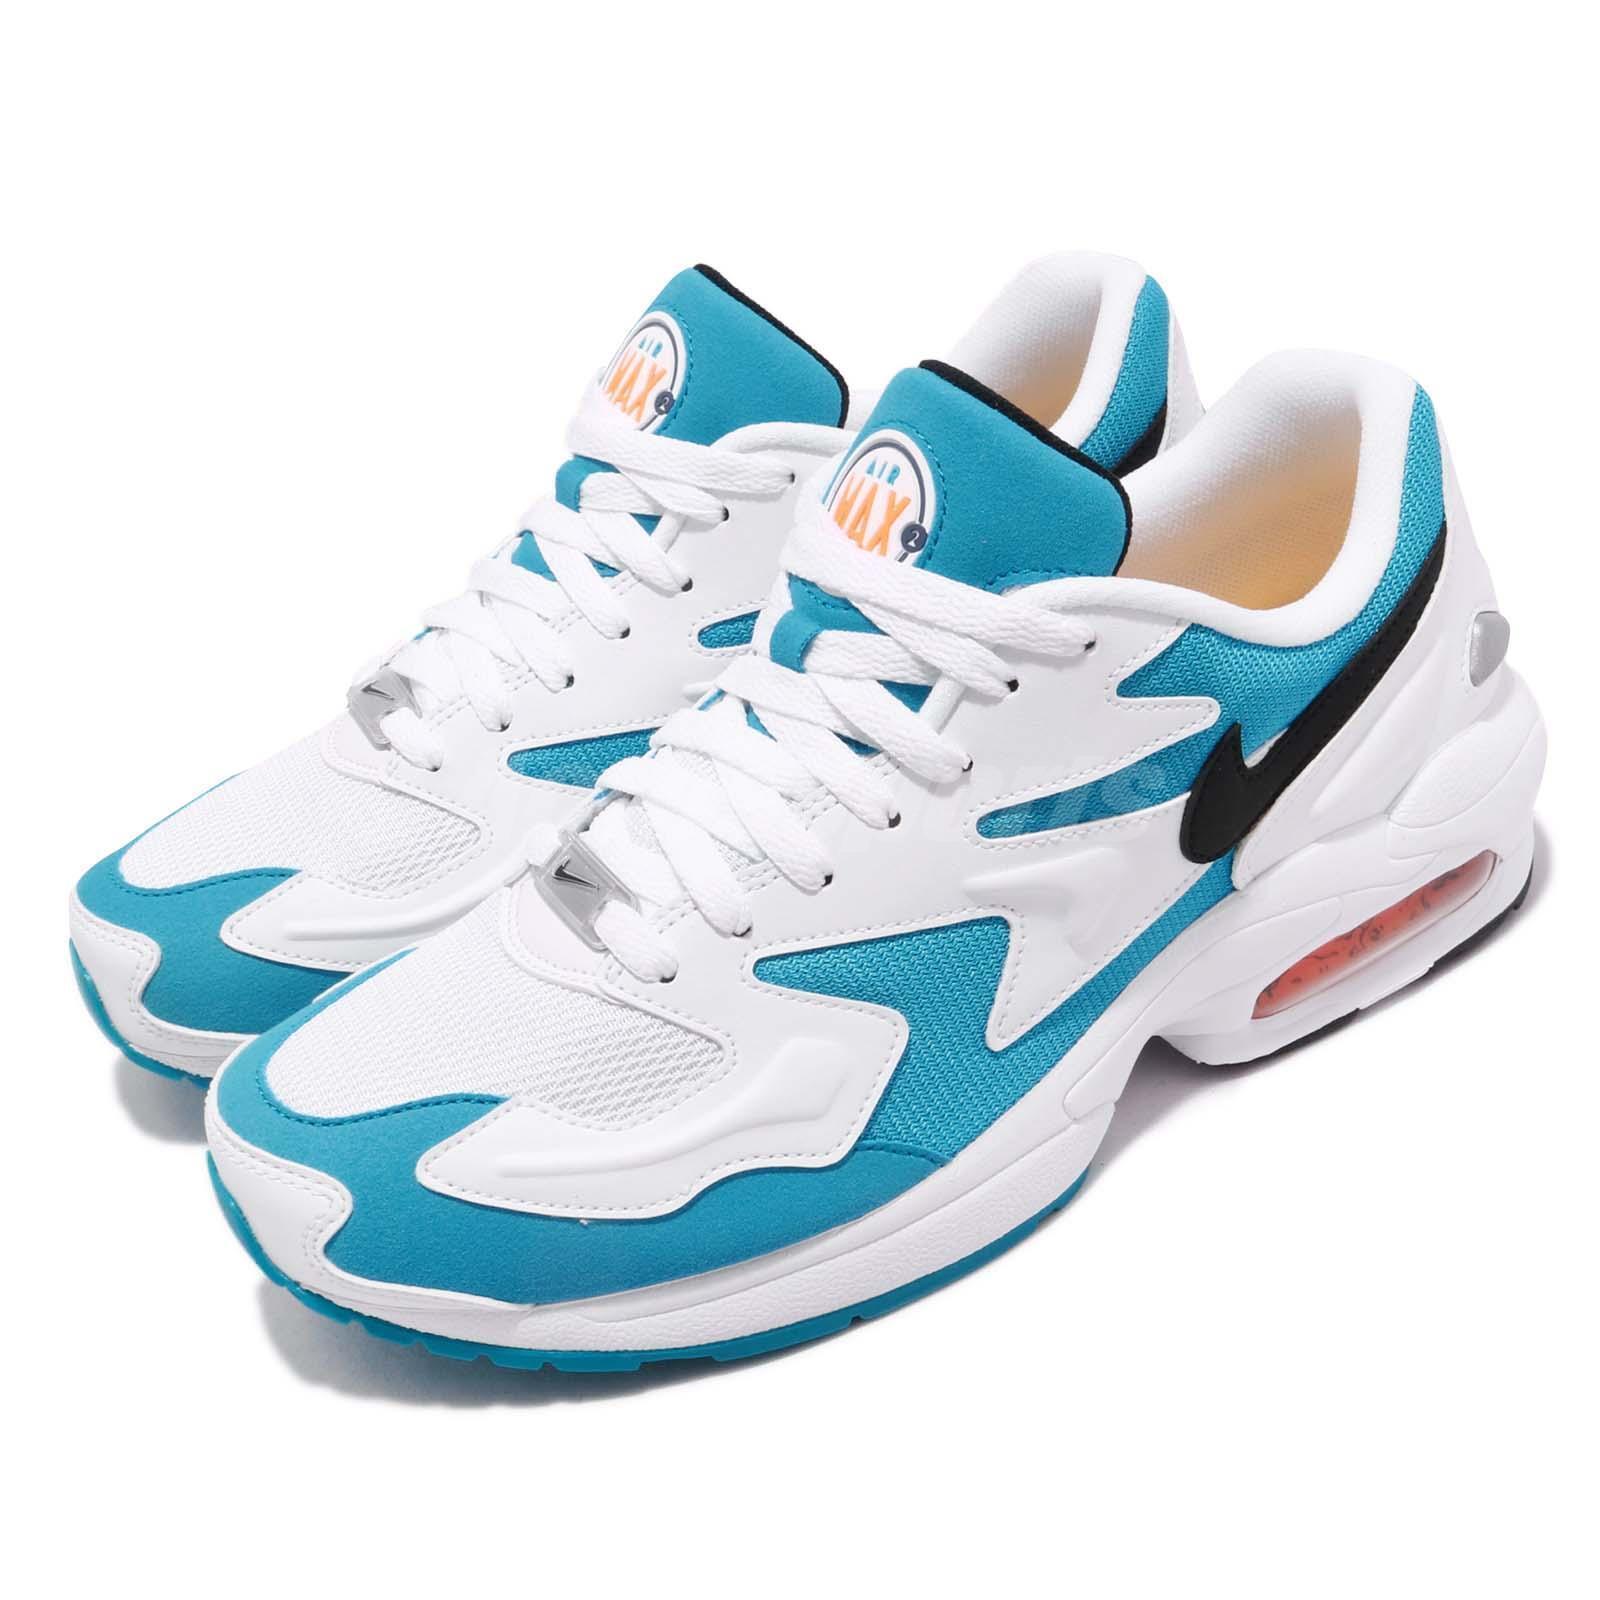 Nike Air Max 2 Light bluee Lagoon Laser Laser Laser orange White Men Running shoes AO1741-100 f13fda